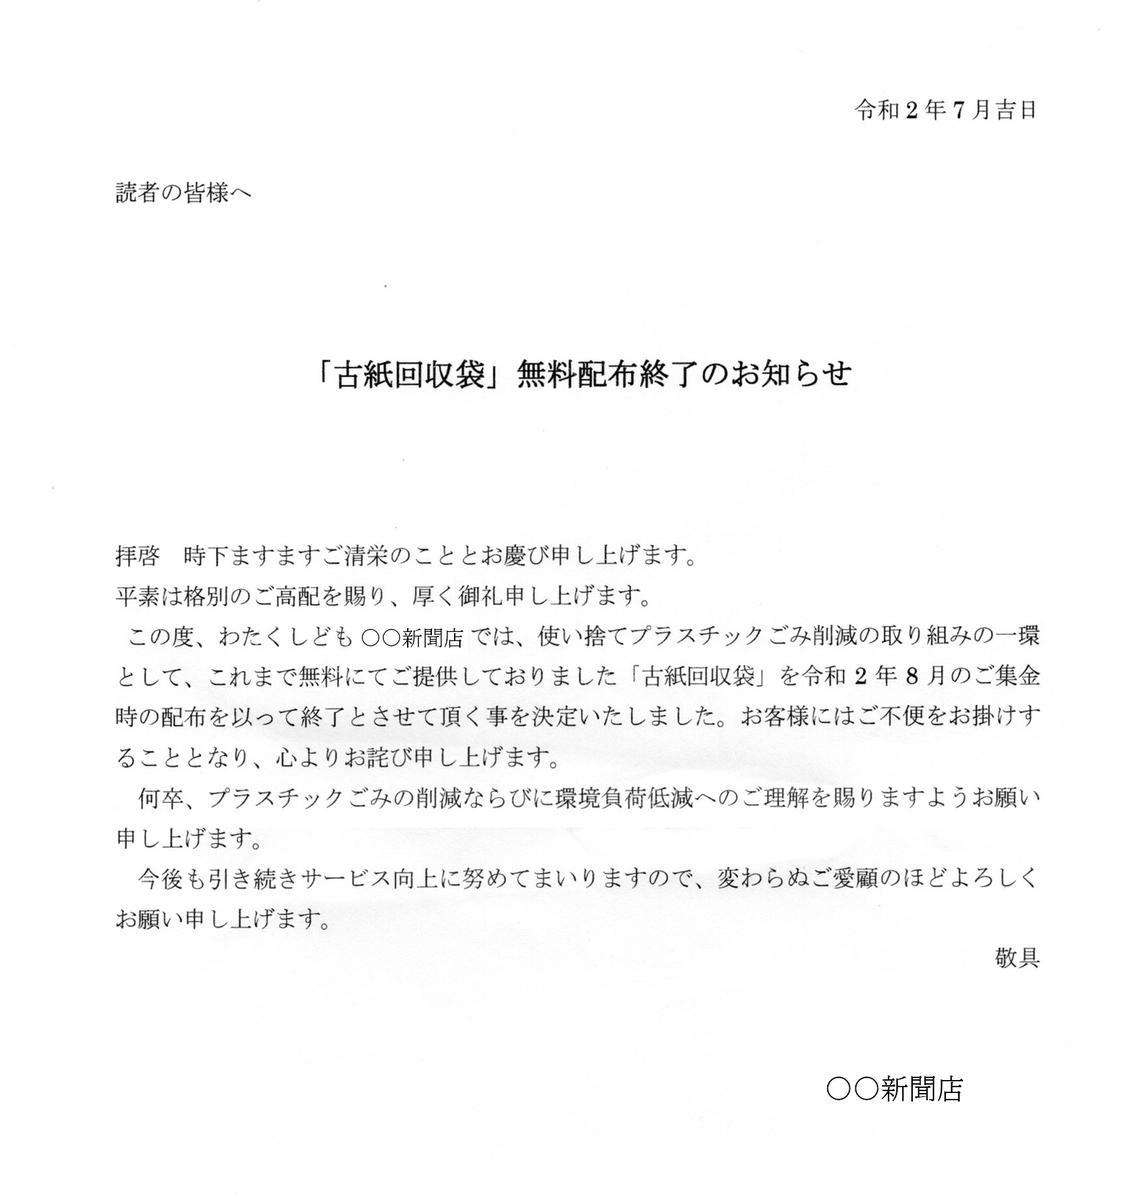 f:id:shinbun-kenkyuujo:20200806105358j:plain